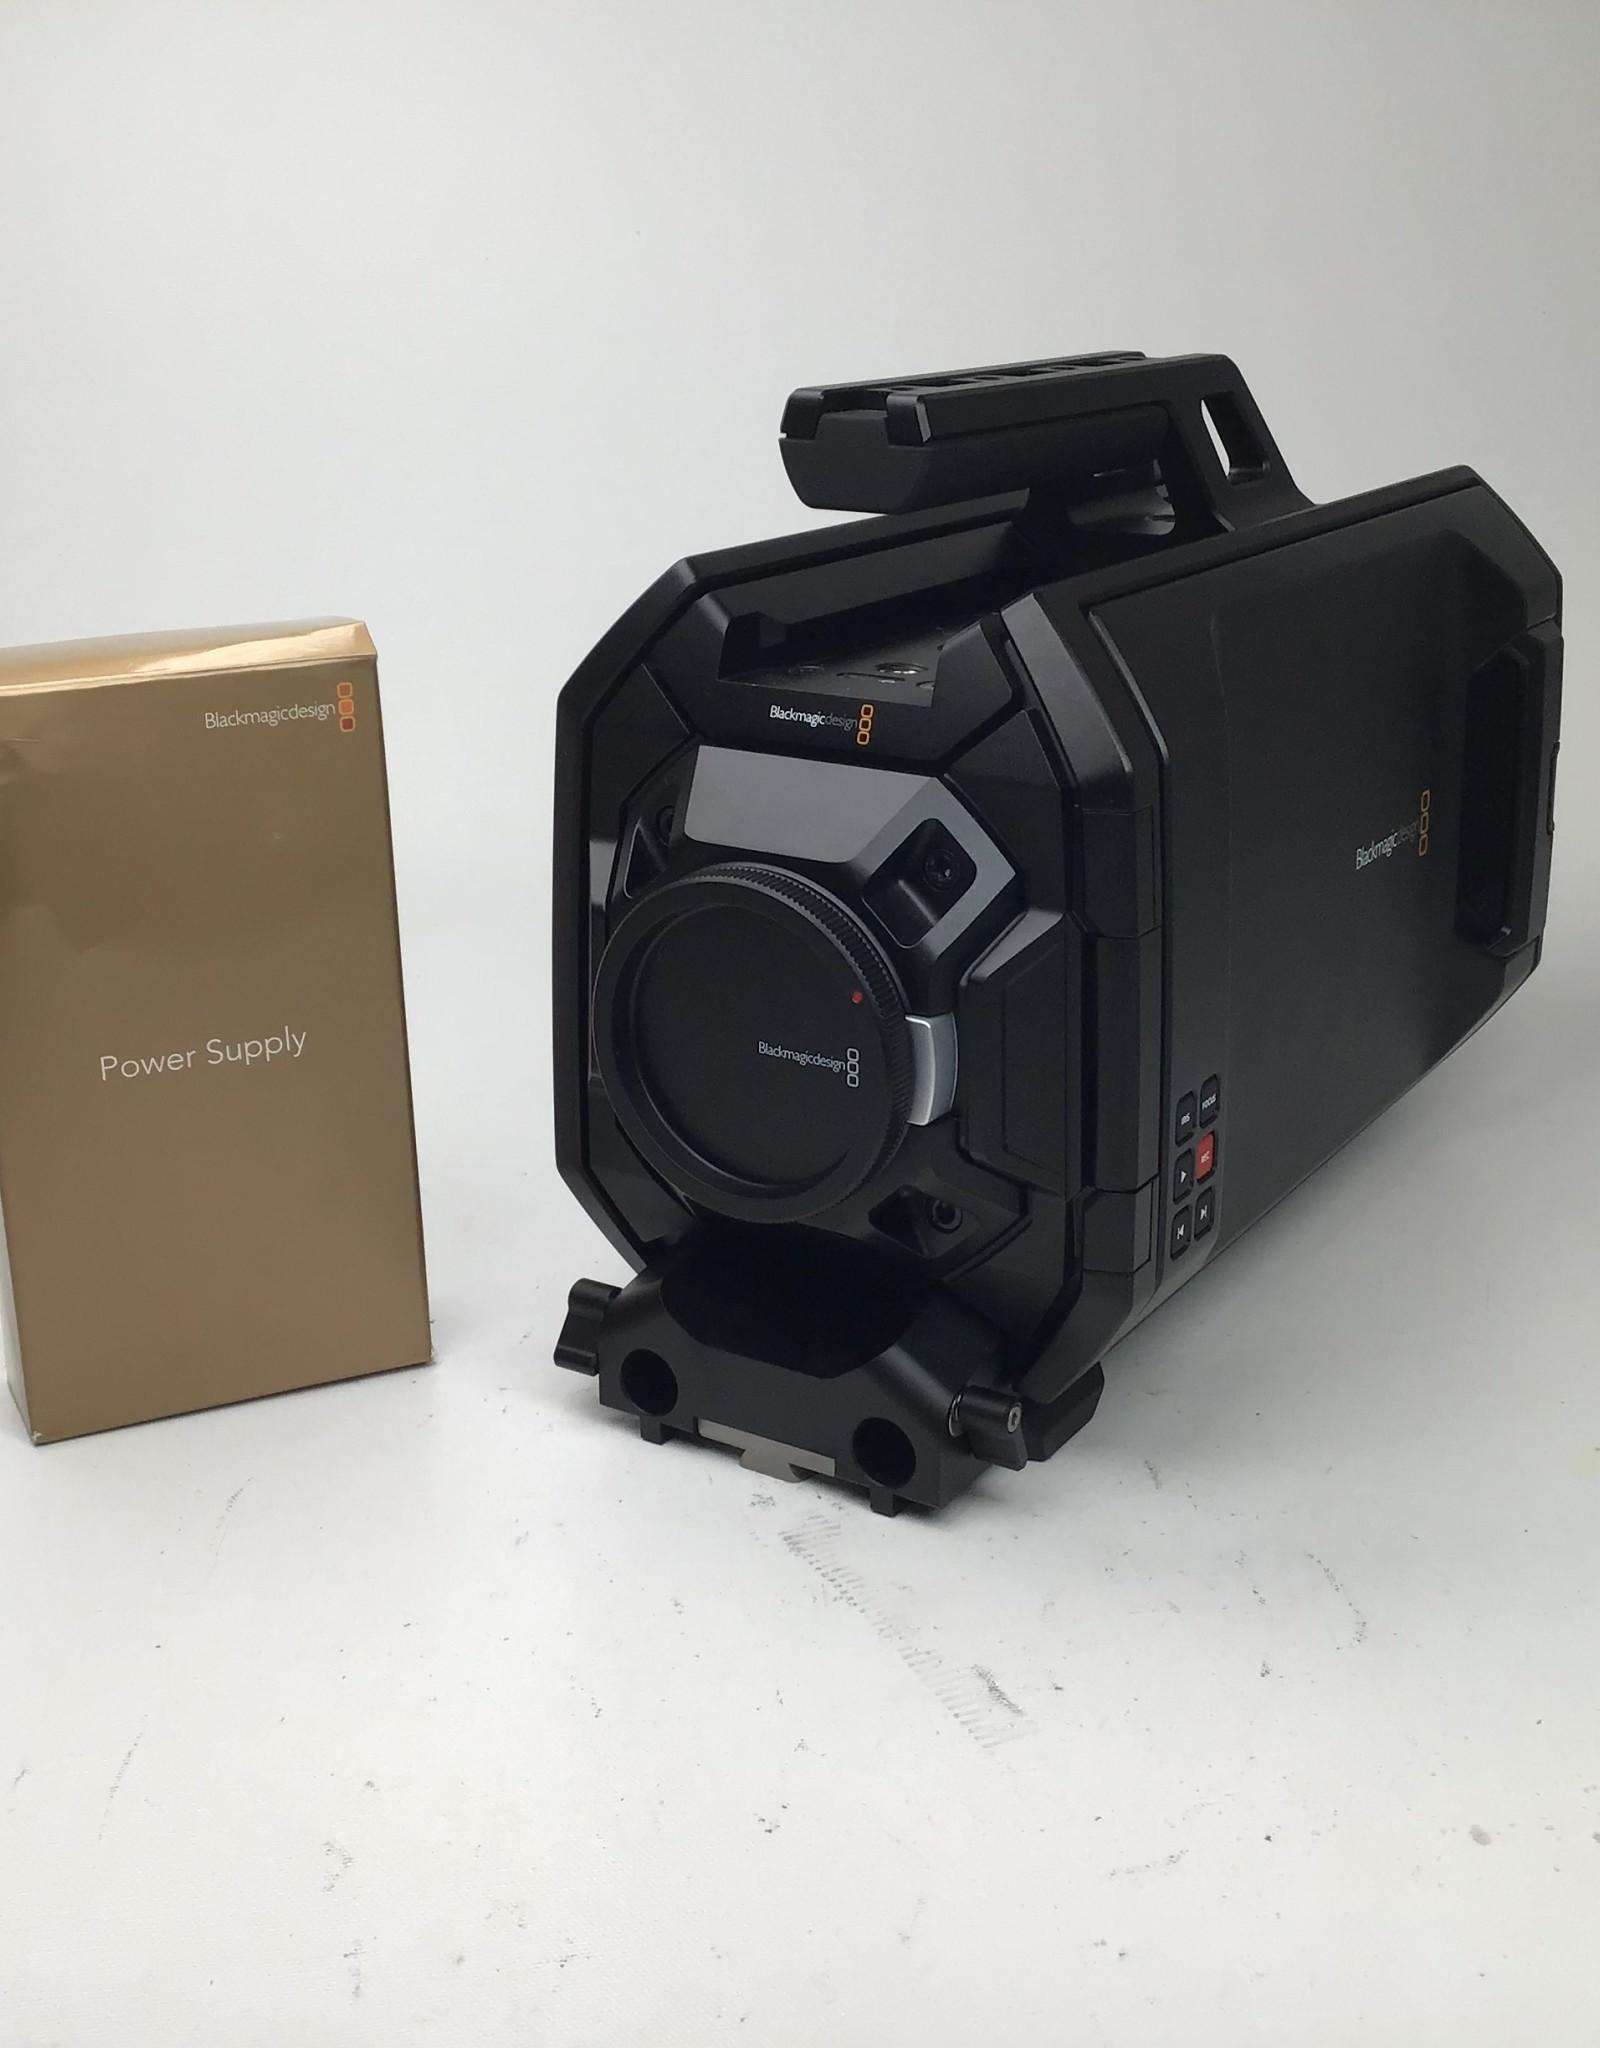 Blackmagic Design Blackmagic Ursa EFV2 Video Camera Used Mint